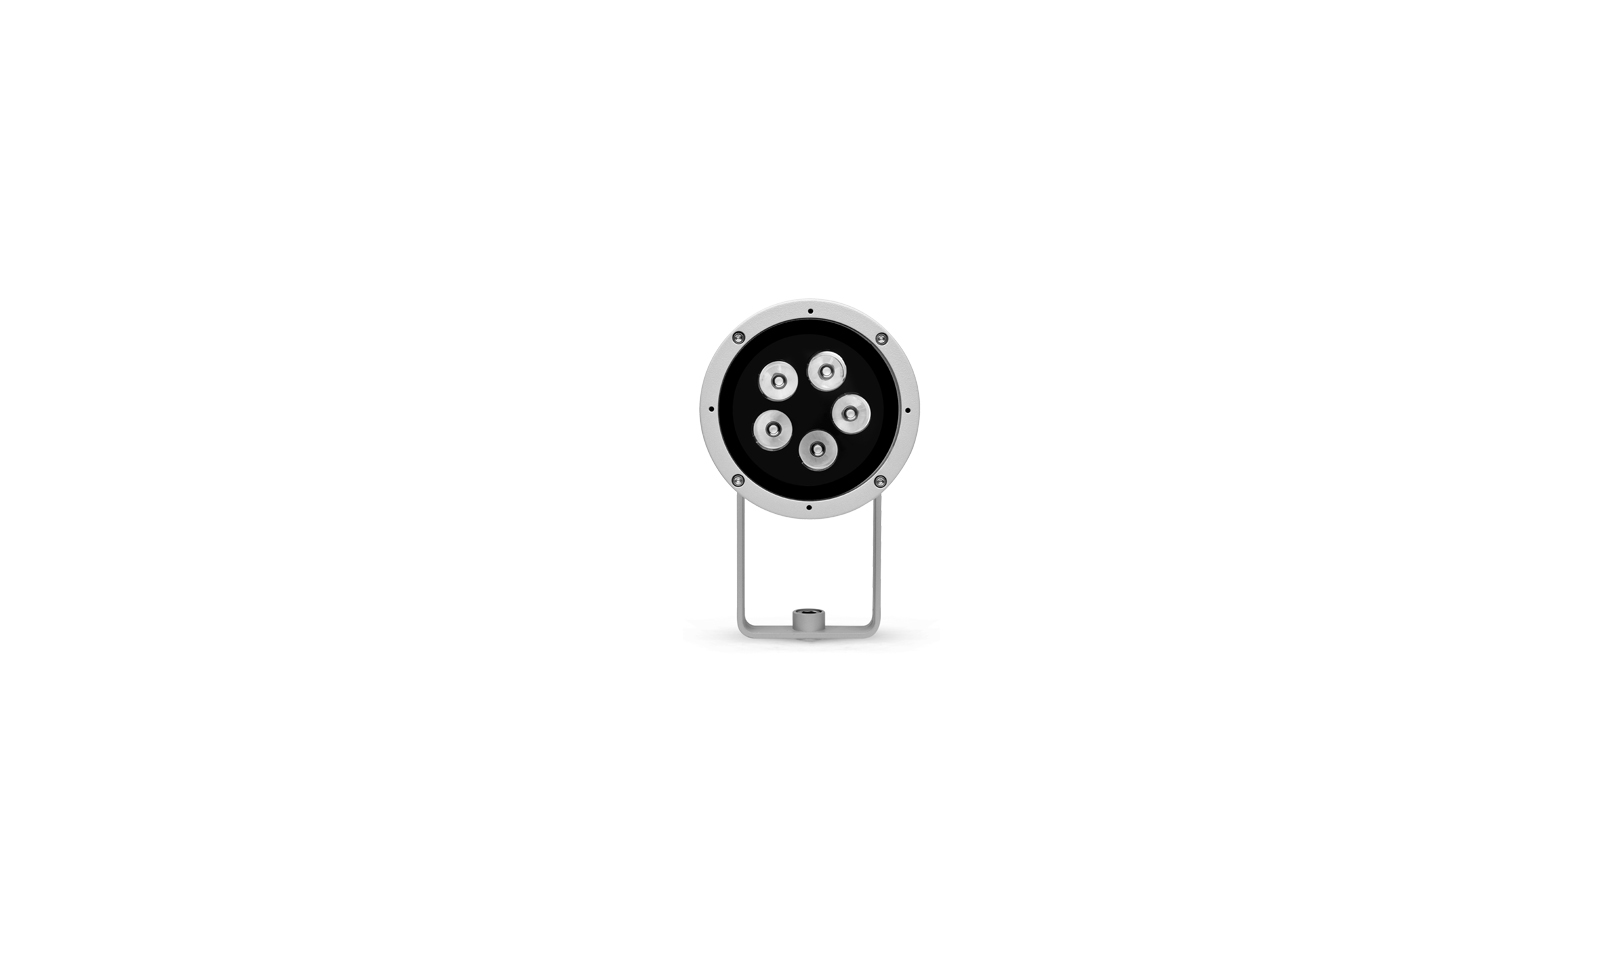 805001-805005 FLASH POLE MEDIUM LED 8W 3